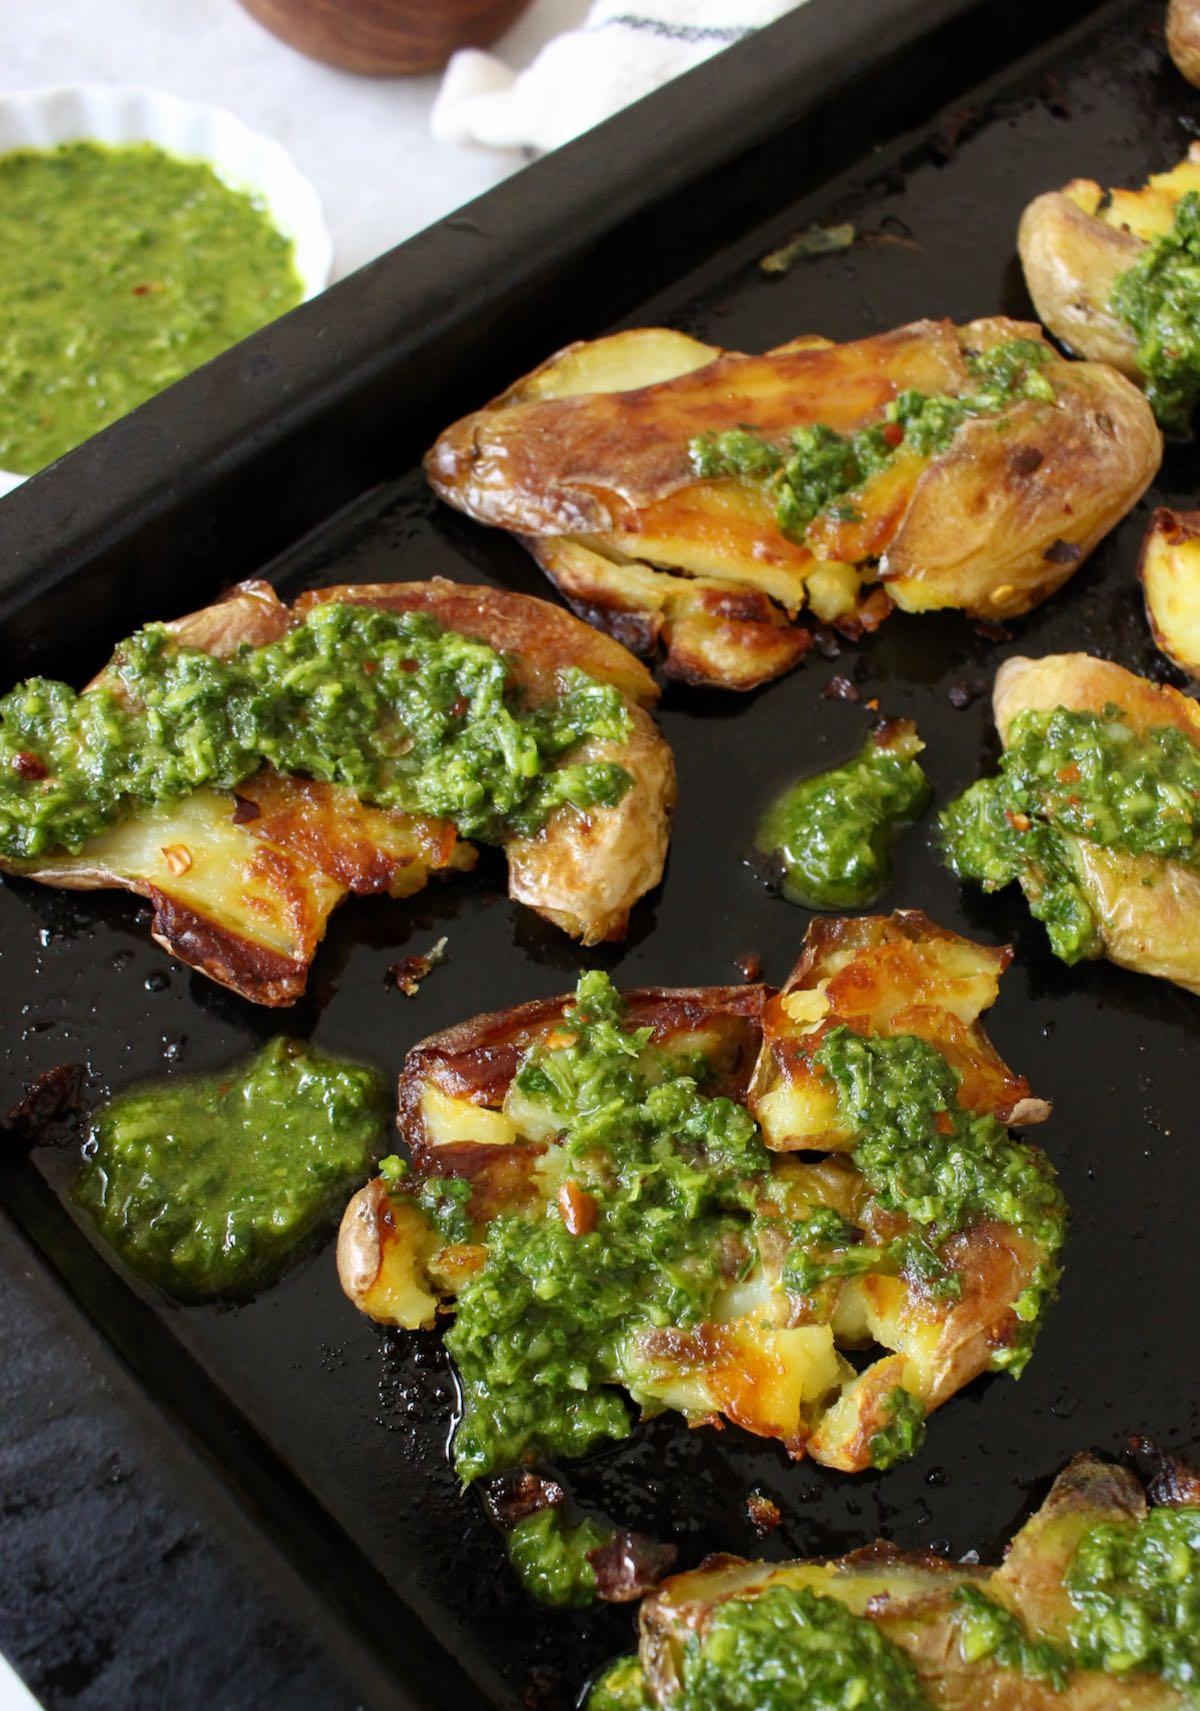 roasted smashed fingerling potatoes with garlic chimichurri sauce